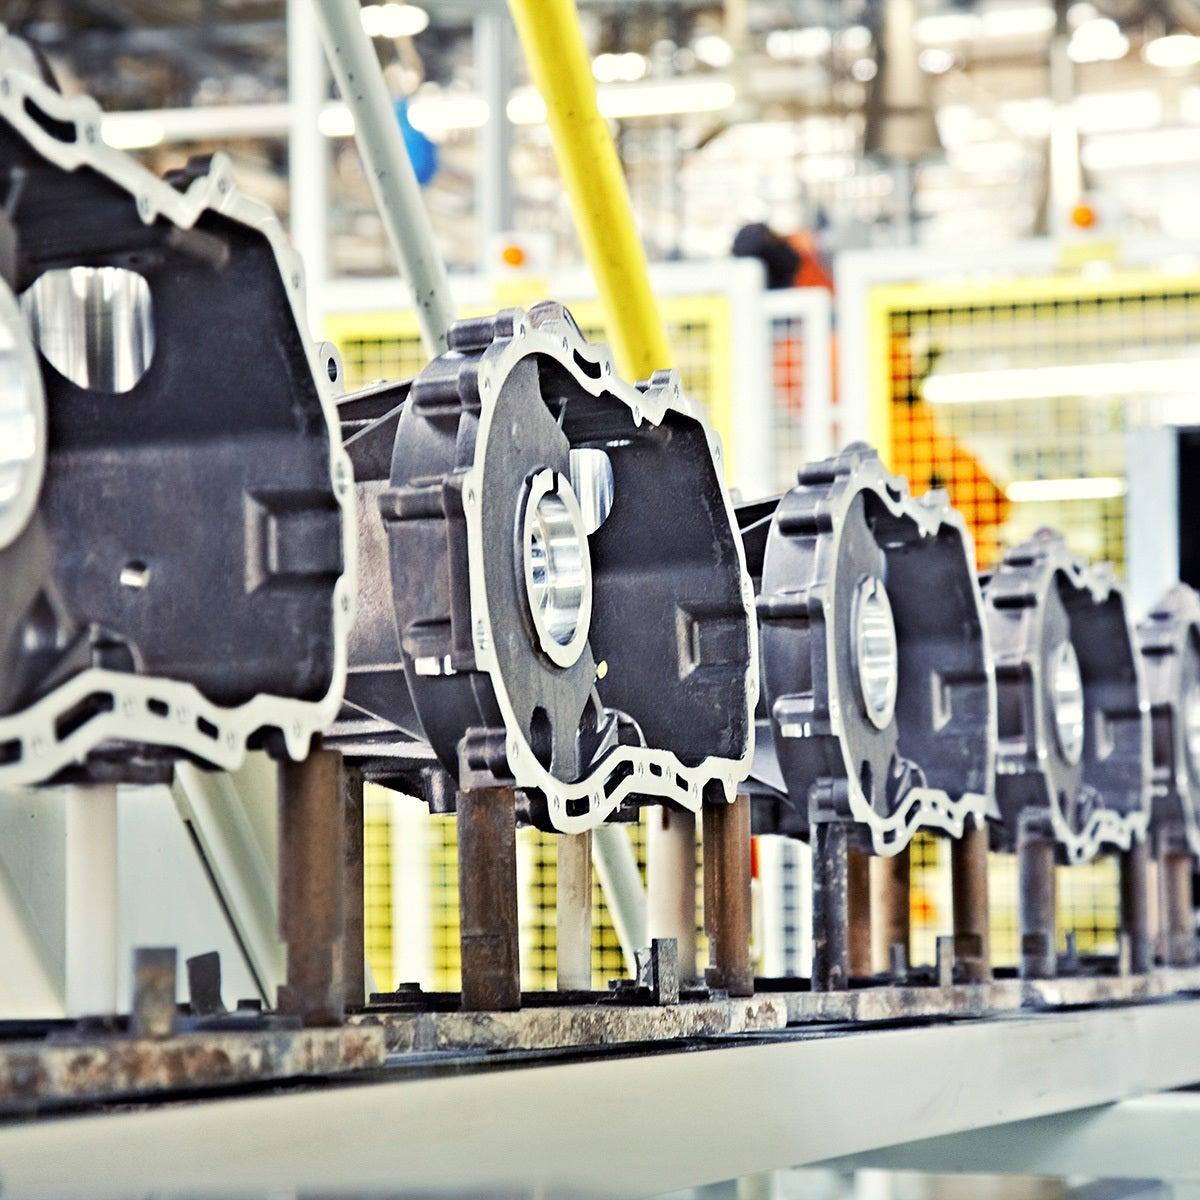 Fitness Equipment Industry Statistics: Industrial Equipment Manufacturing